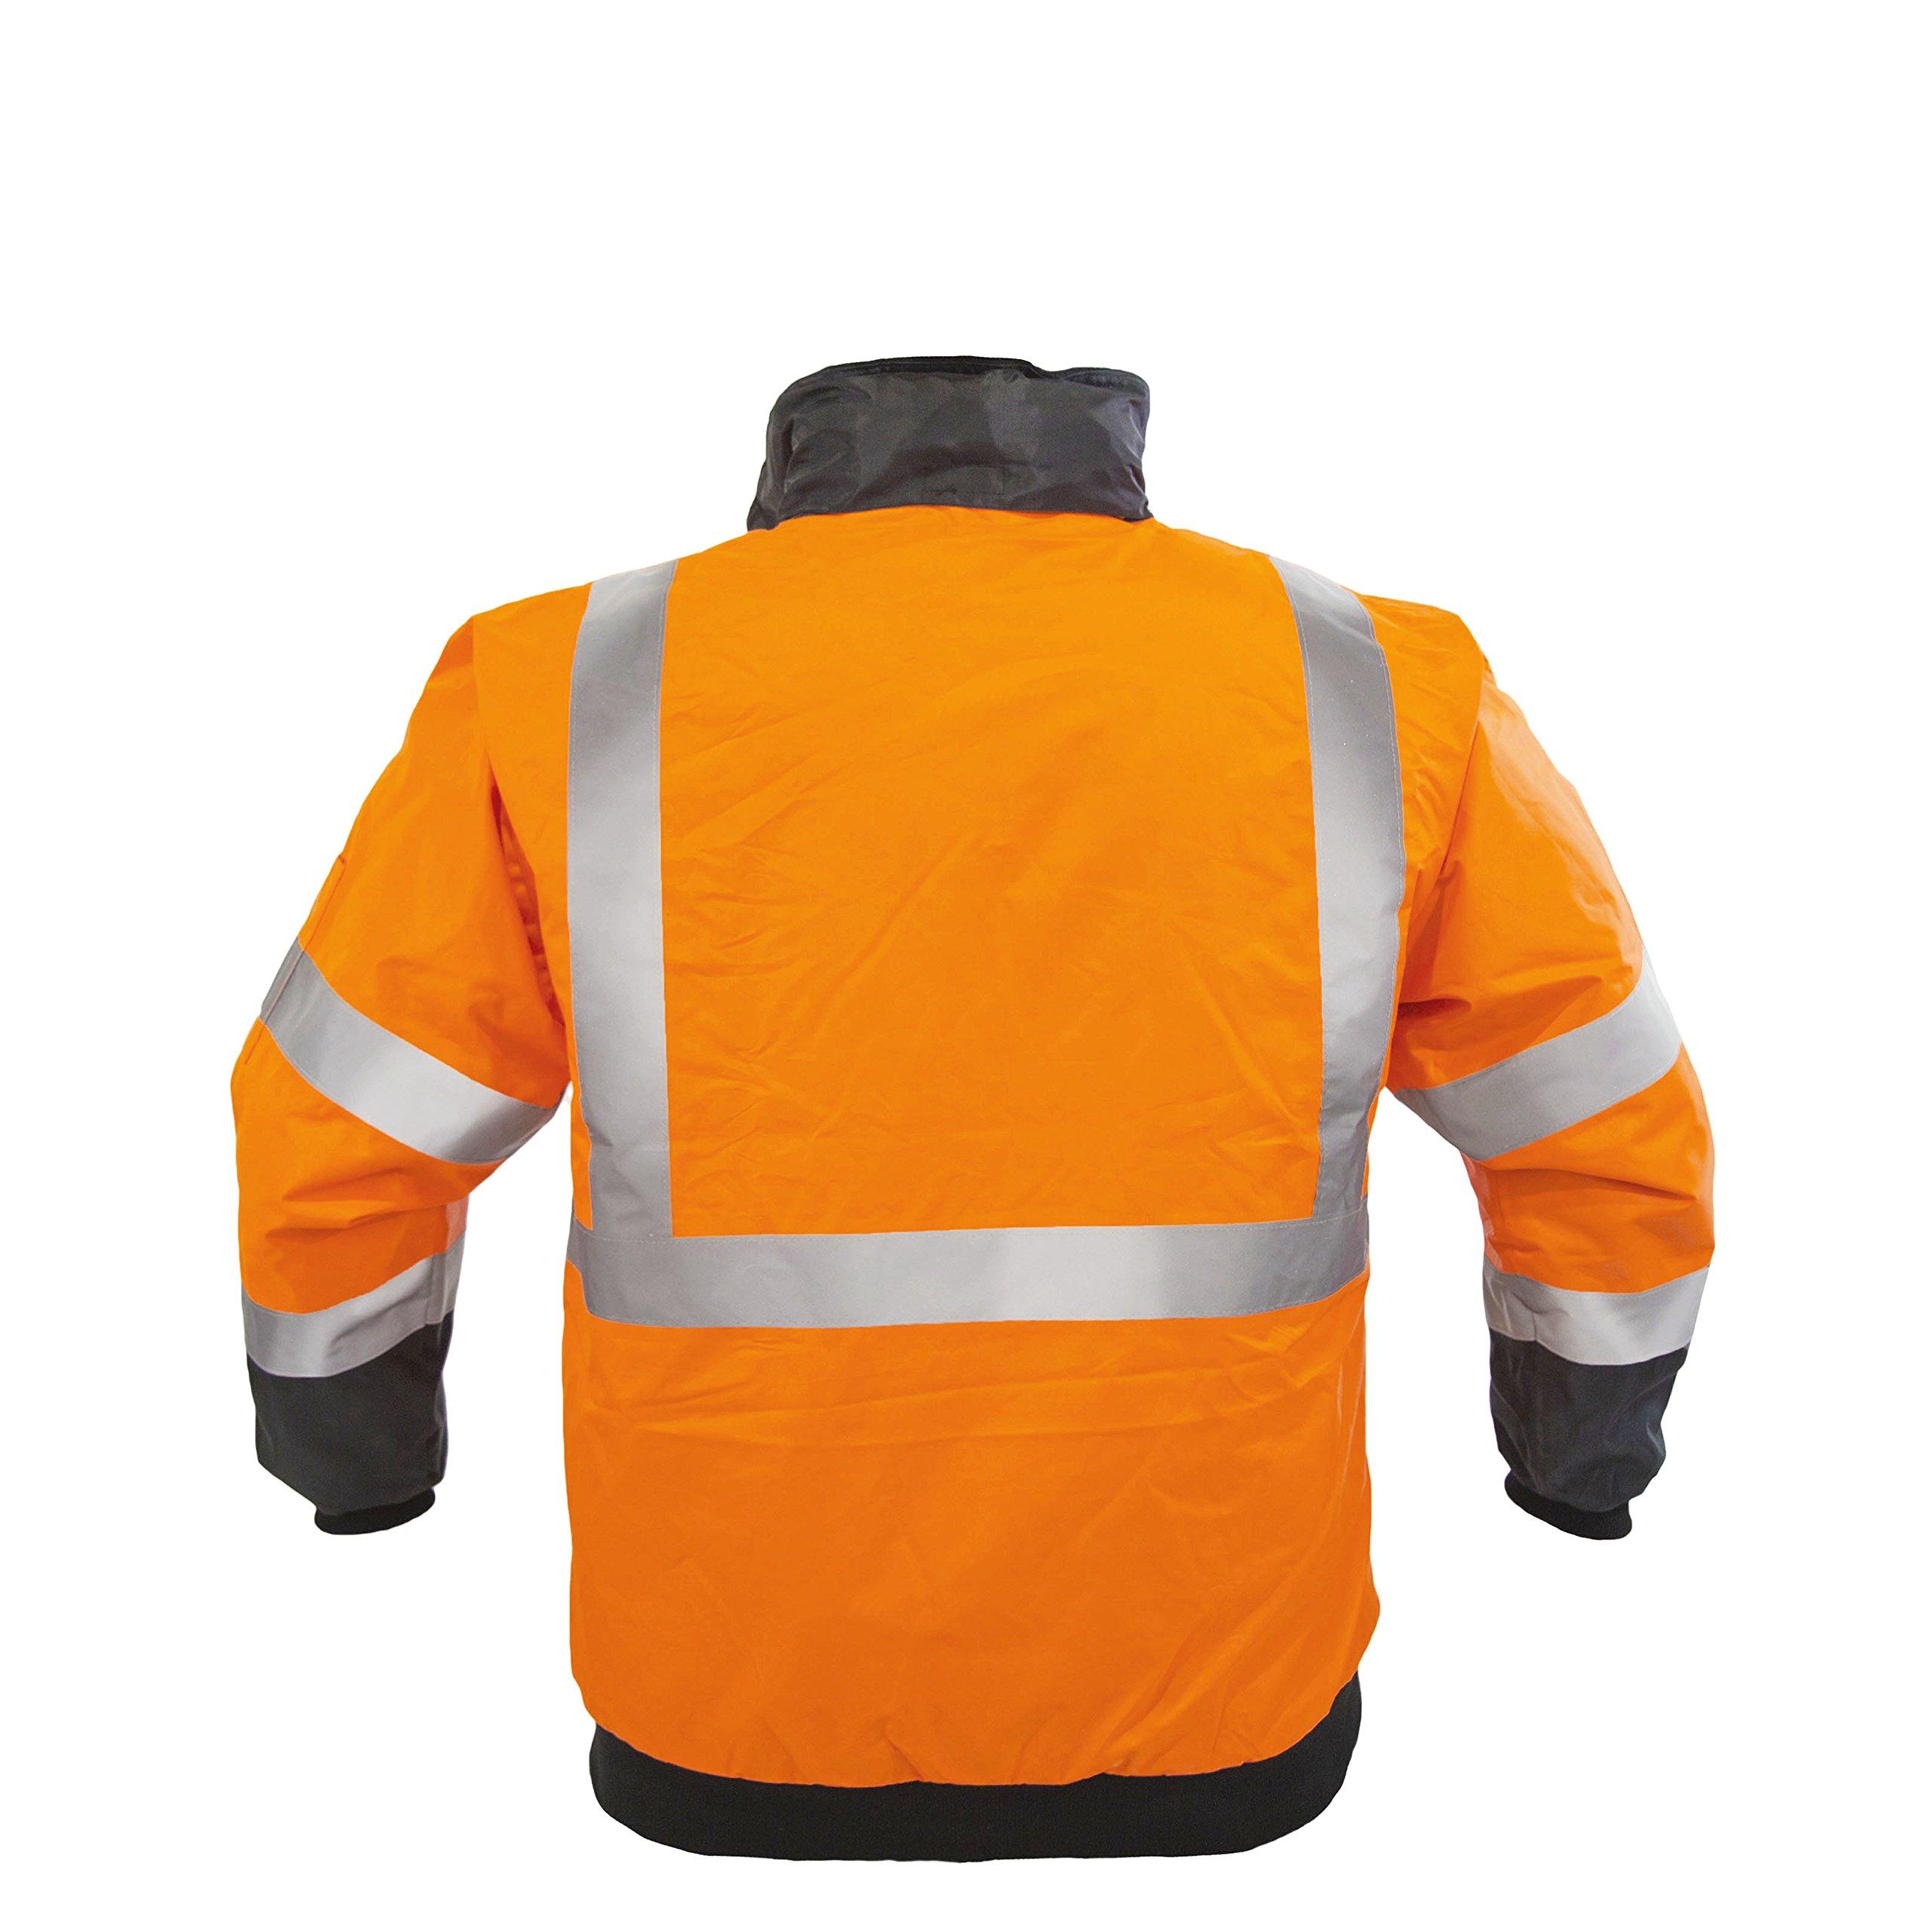 JORESTECH High Visibility Waterproof Bomber Jacket (3X-Large, Orange) by JORESTECH  (Image #5)